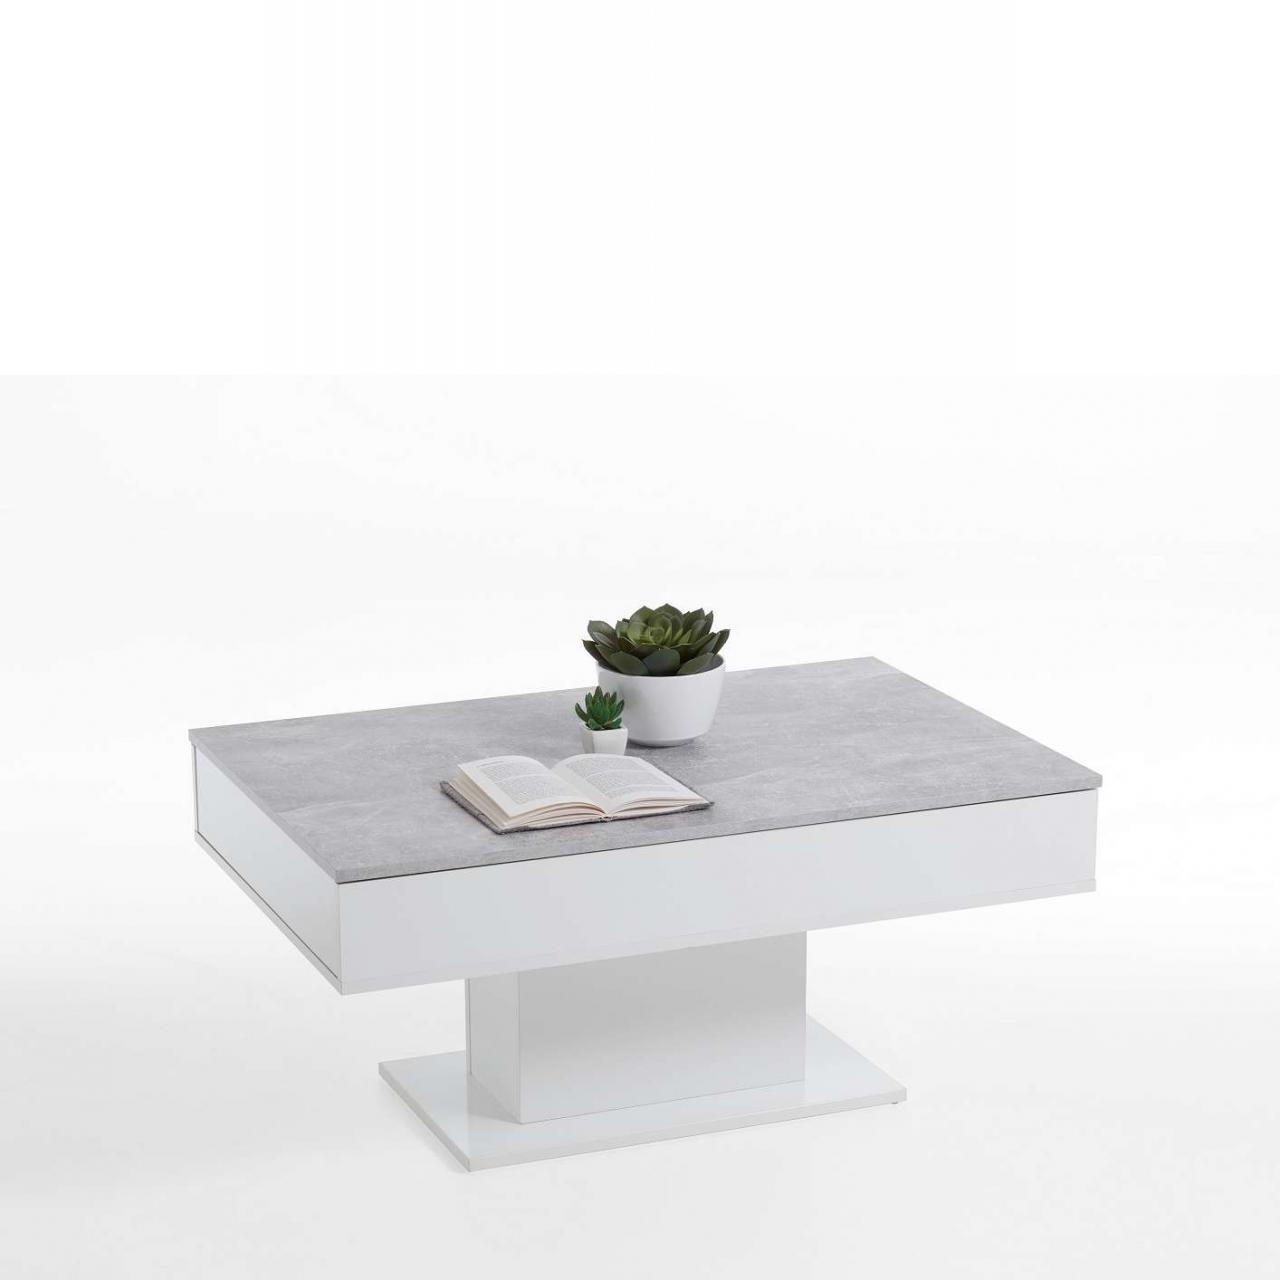 Couchtisch Avola 2 - Beton/Weiss